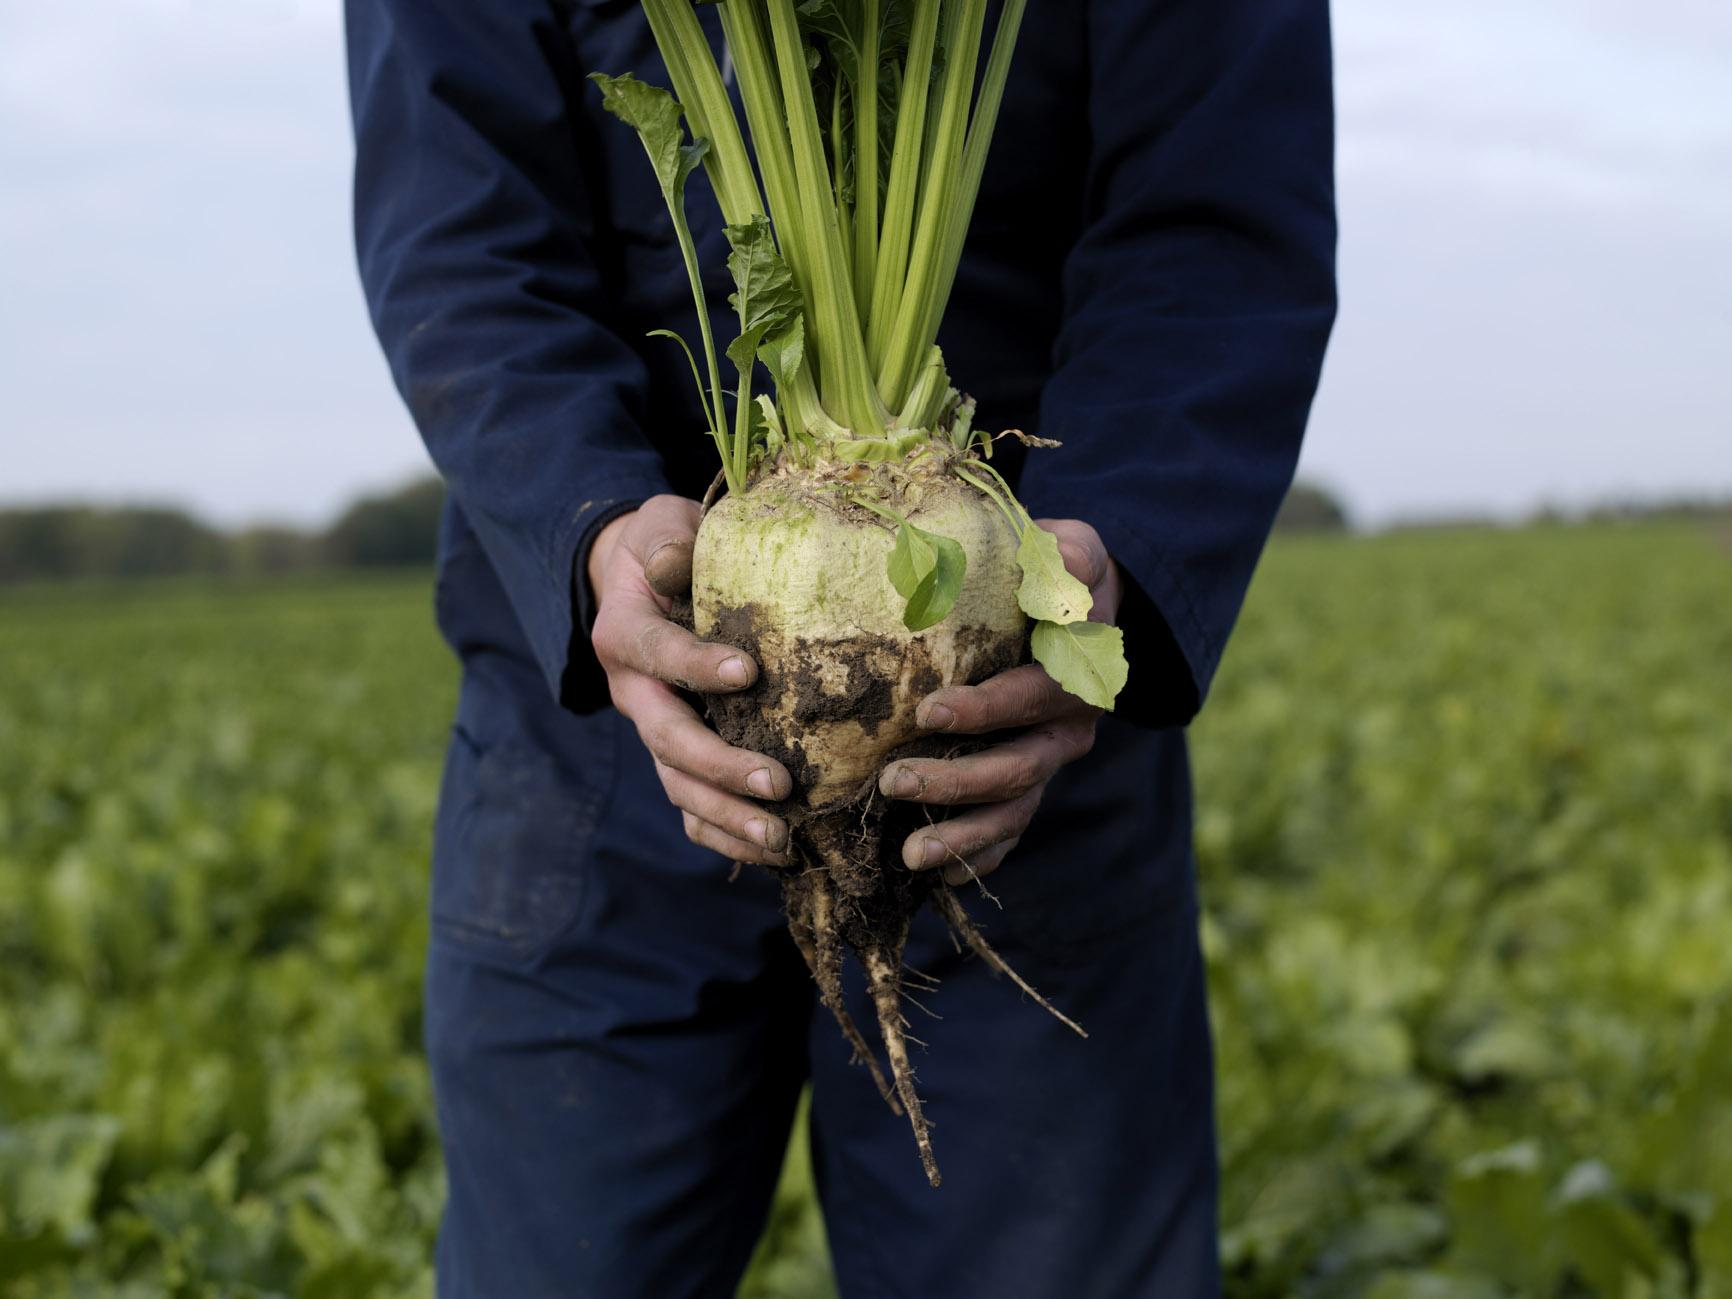 Cosun Beet Company - Precision farming met datagedreven advies